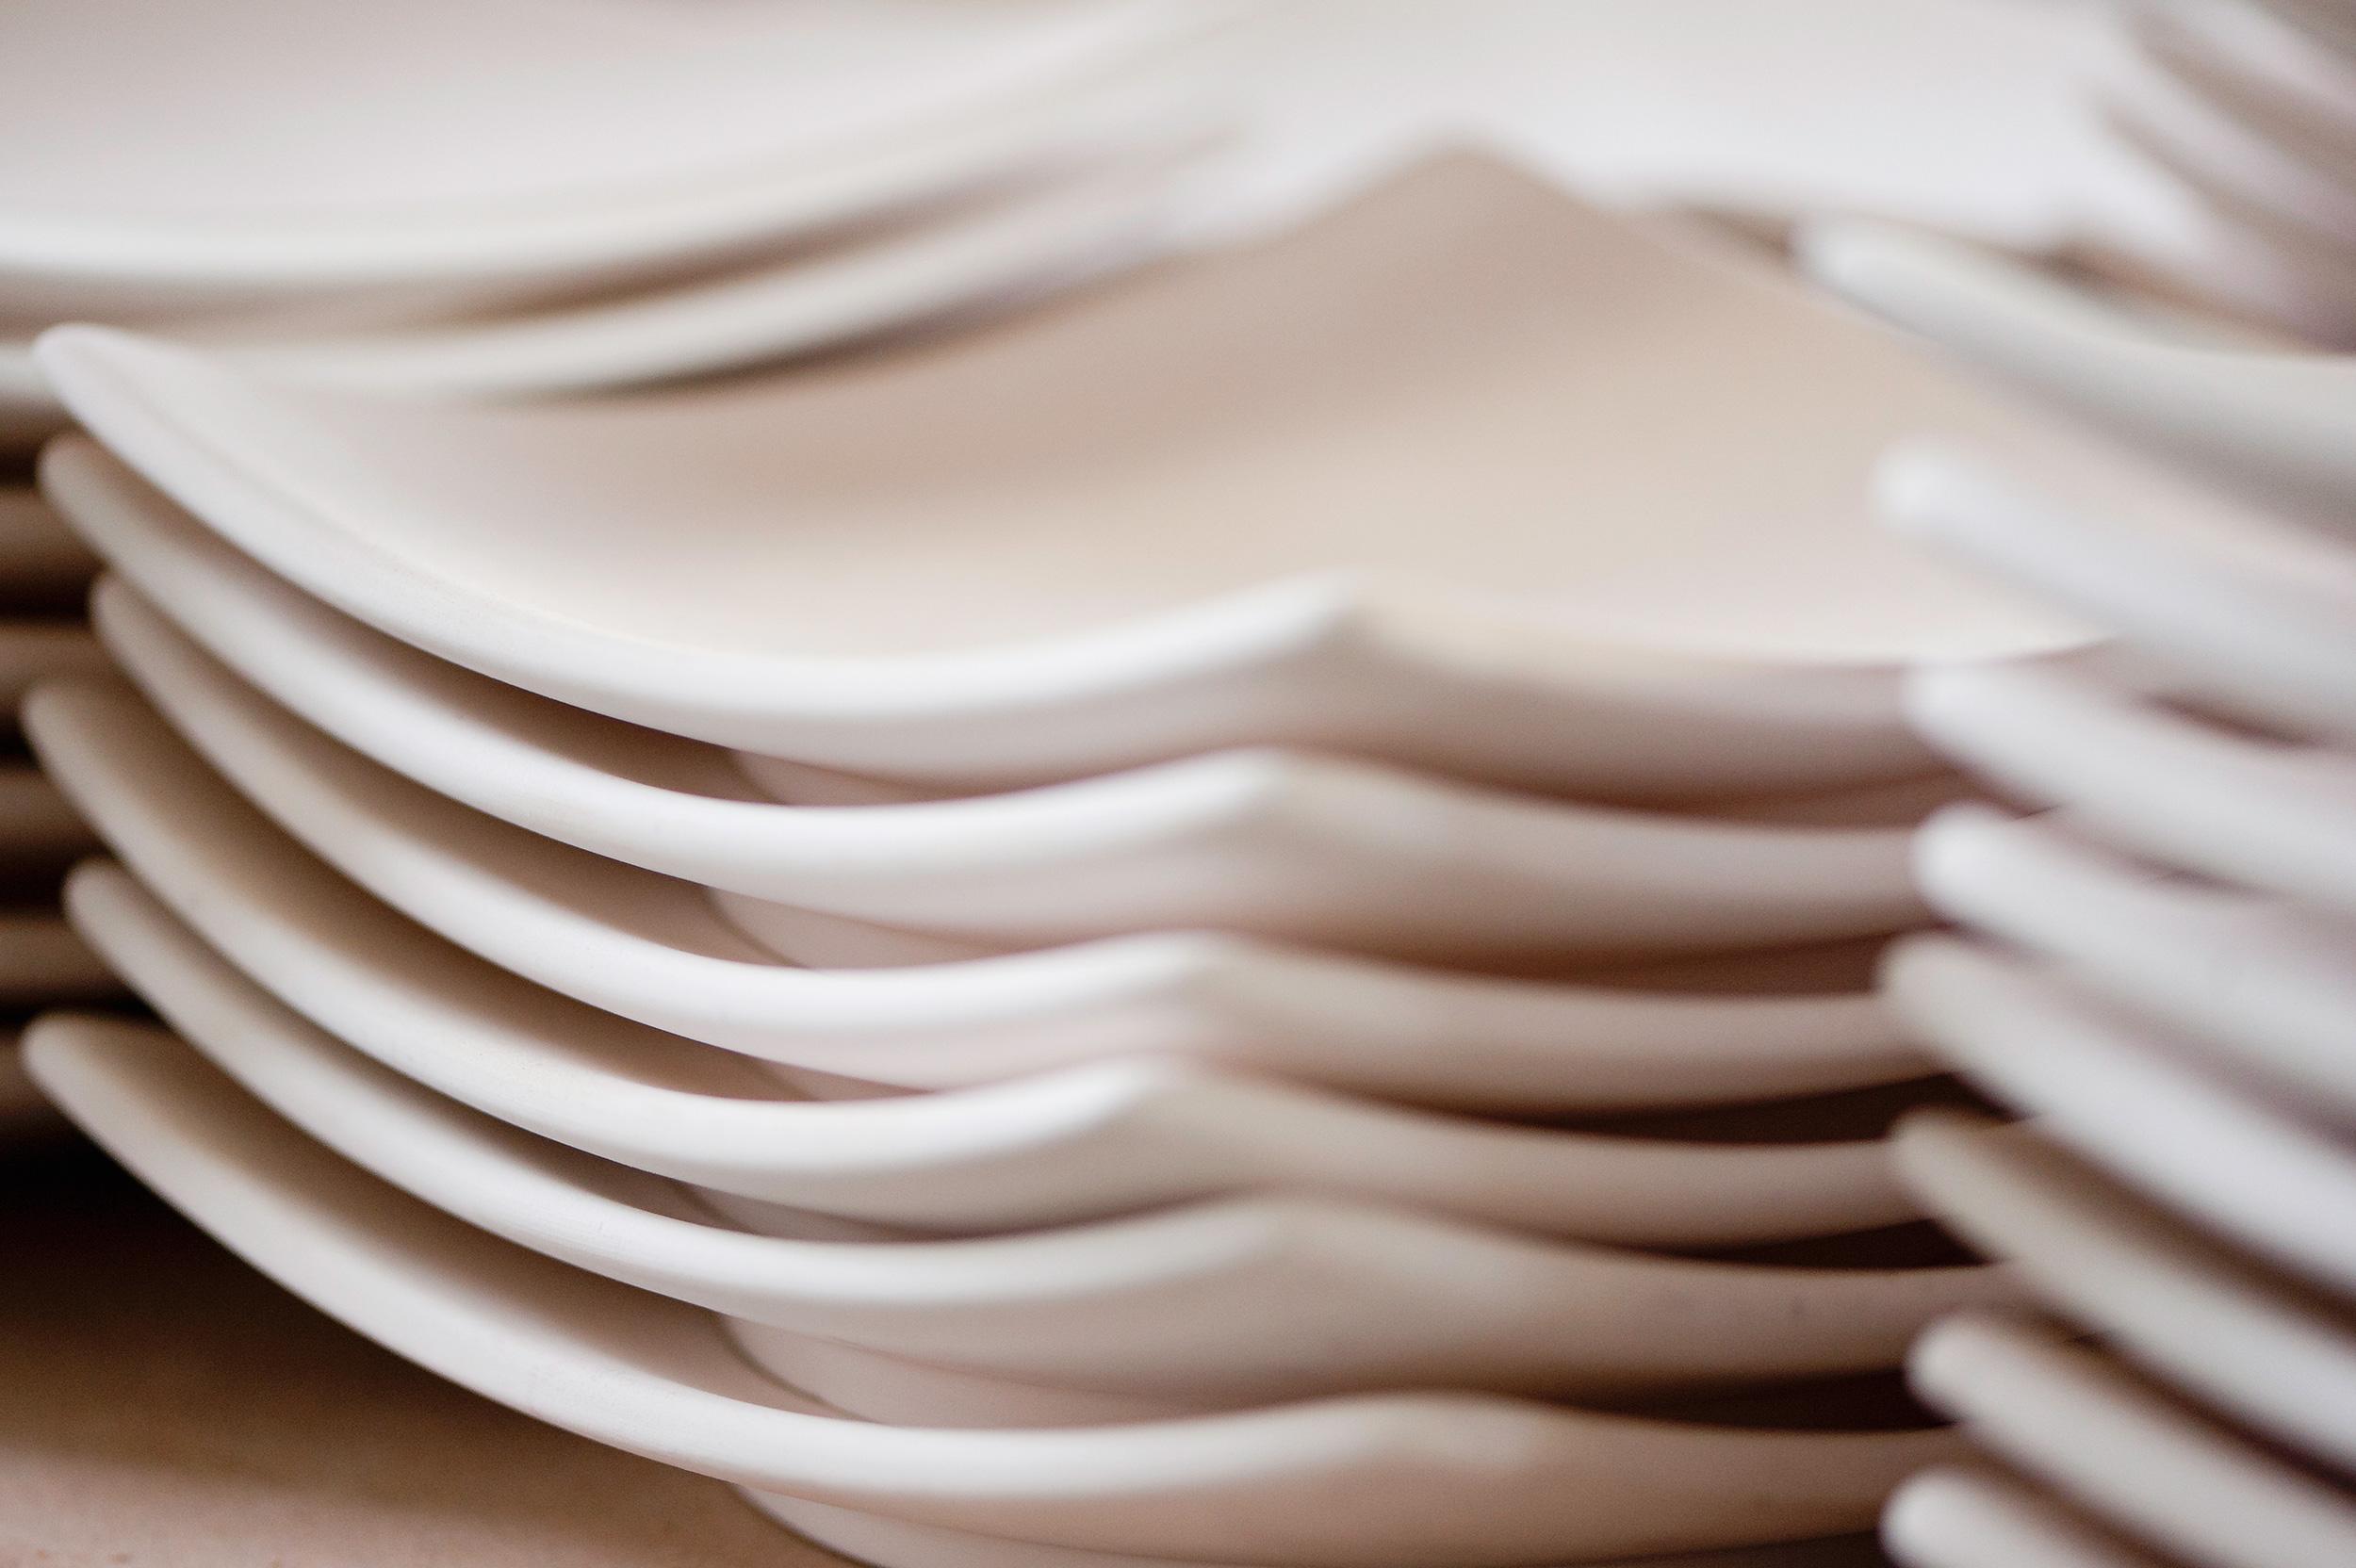 kapula-handmade-ceramics-craft-factory-plates-stacked.jpg